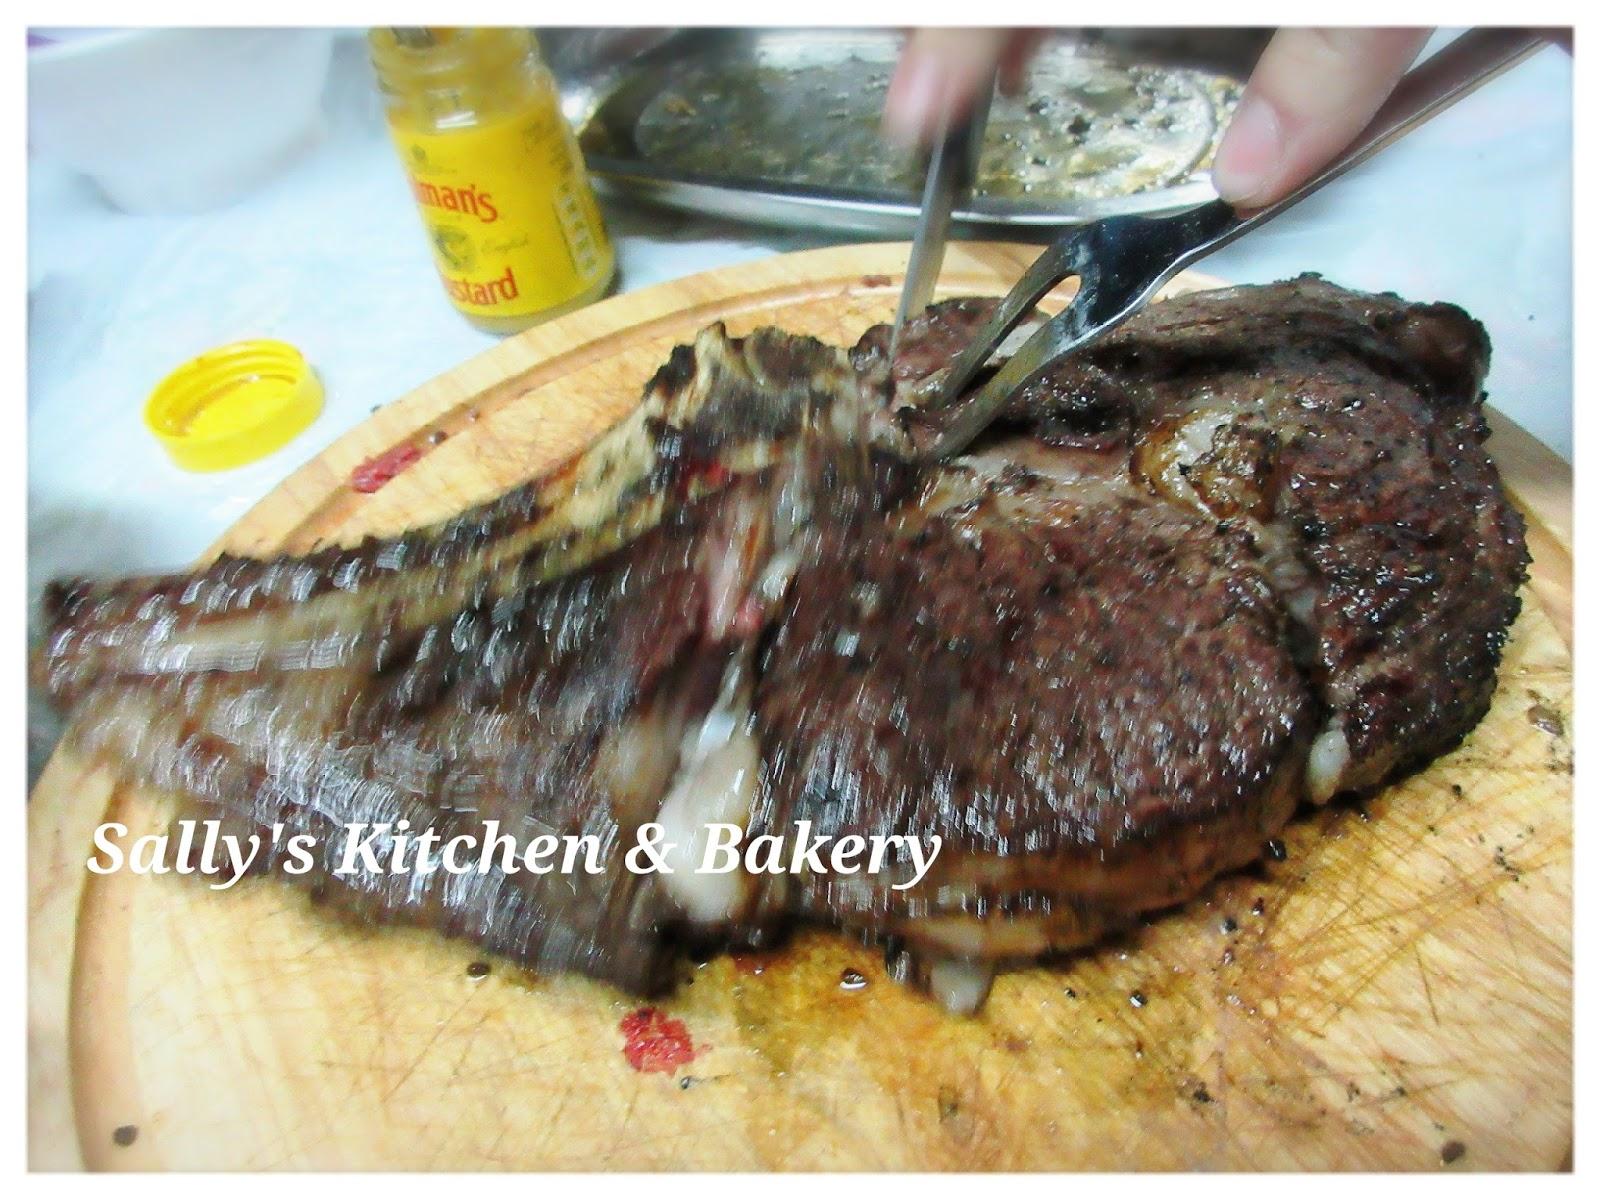 Sally's Kitchen & Bakery: [低溫慢煮] 斧頭牛扒 (附食譜) - Sous Vide 及 BBQ派對